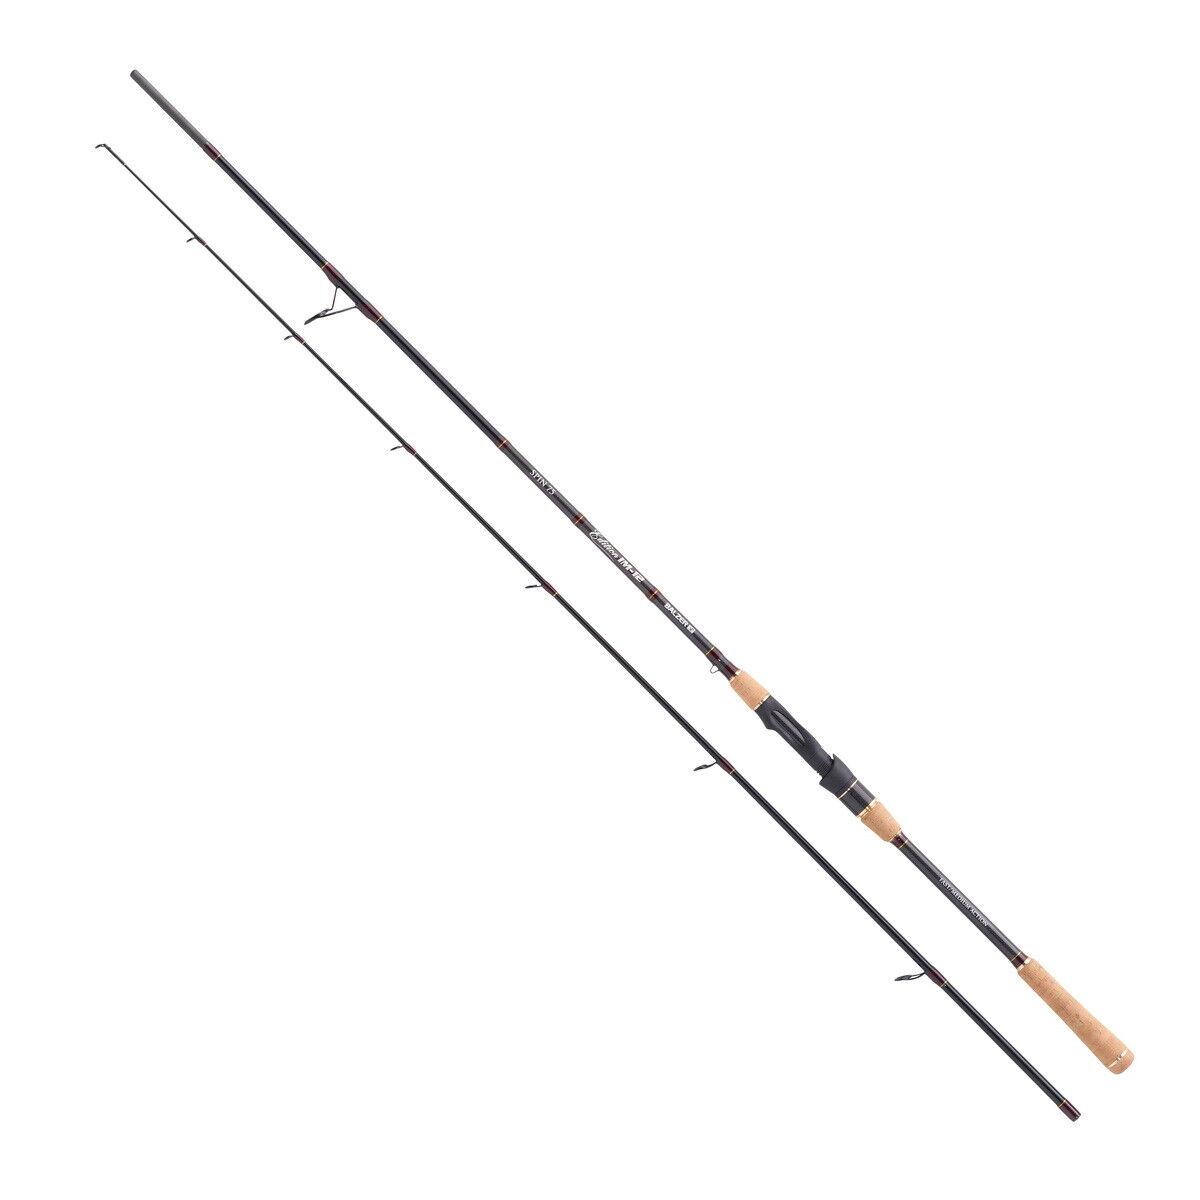 Balzer Edition im-12 Steck modello 2016 SPIN 75 2,95m steckrute SPIN